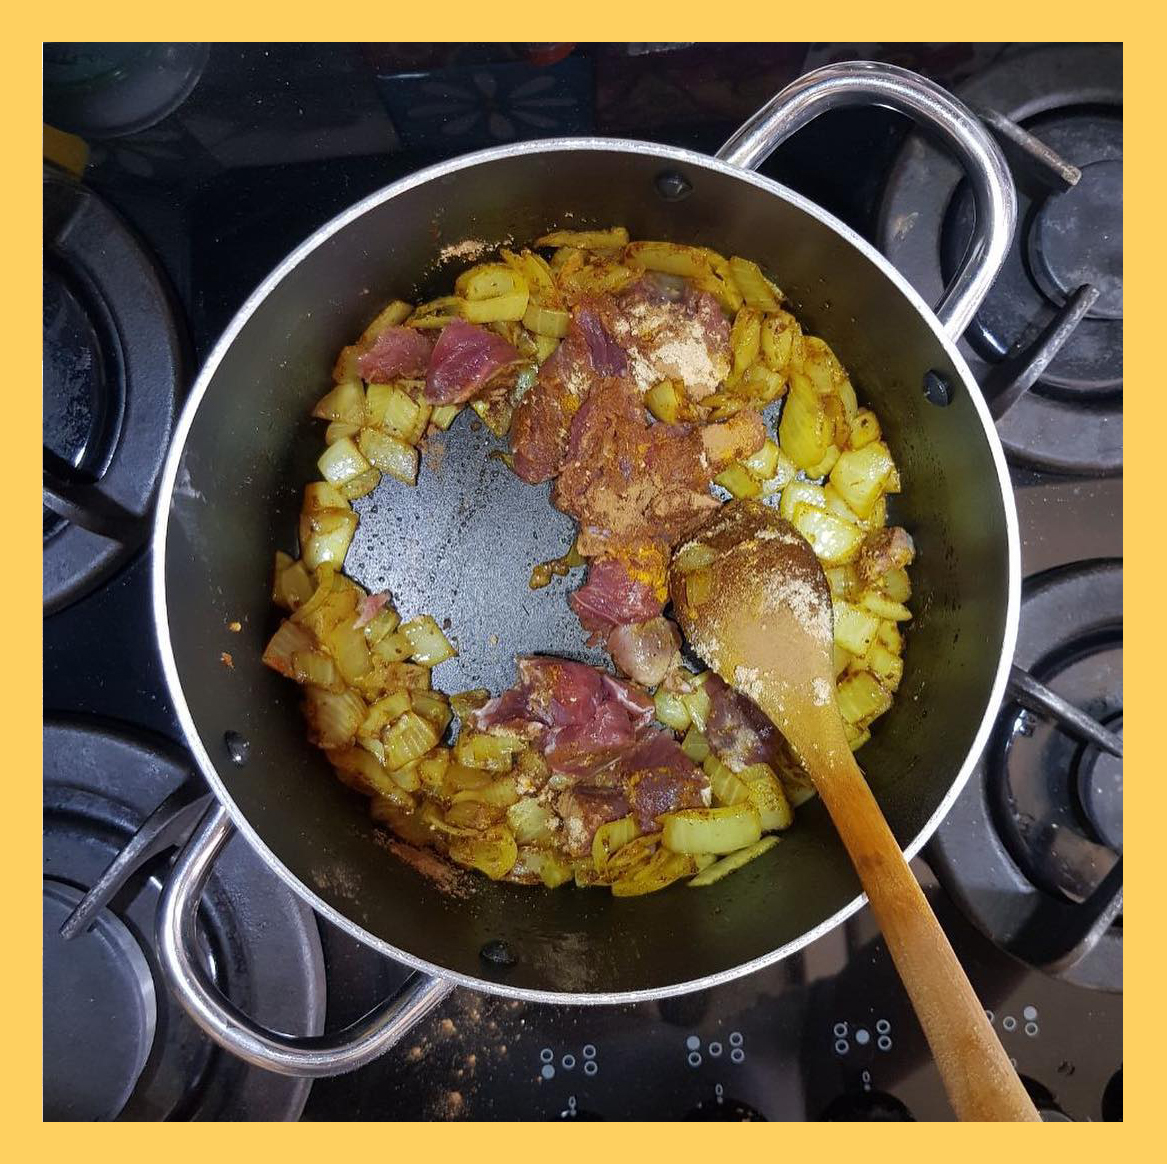 lamb meat and fried onions, پیاز و گوشت تفت داده شده